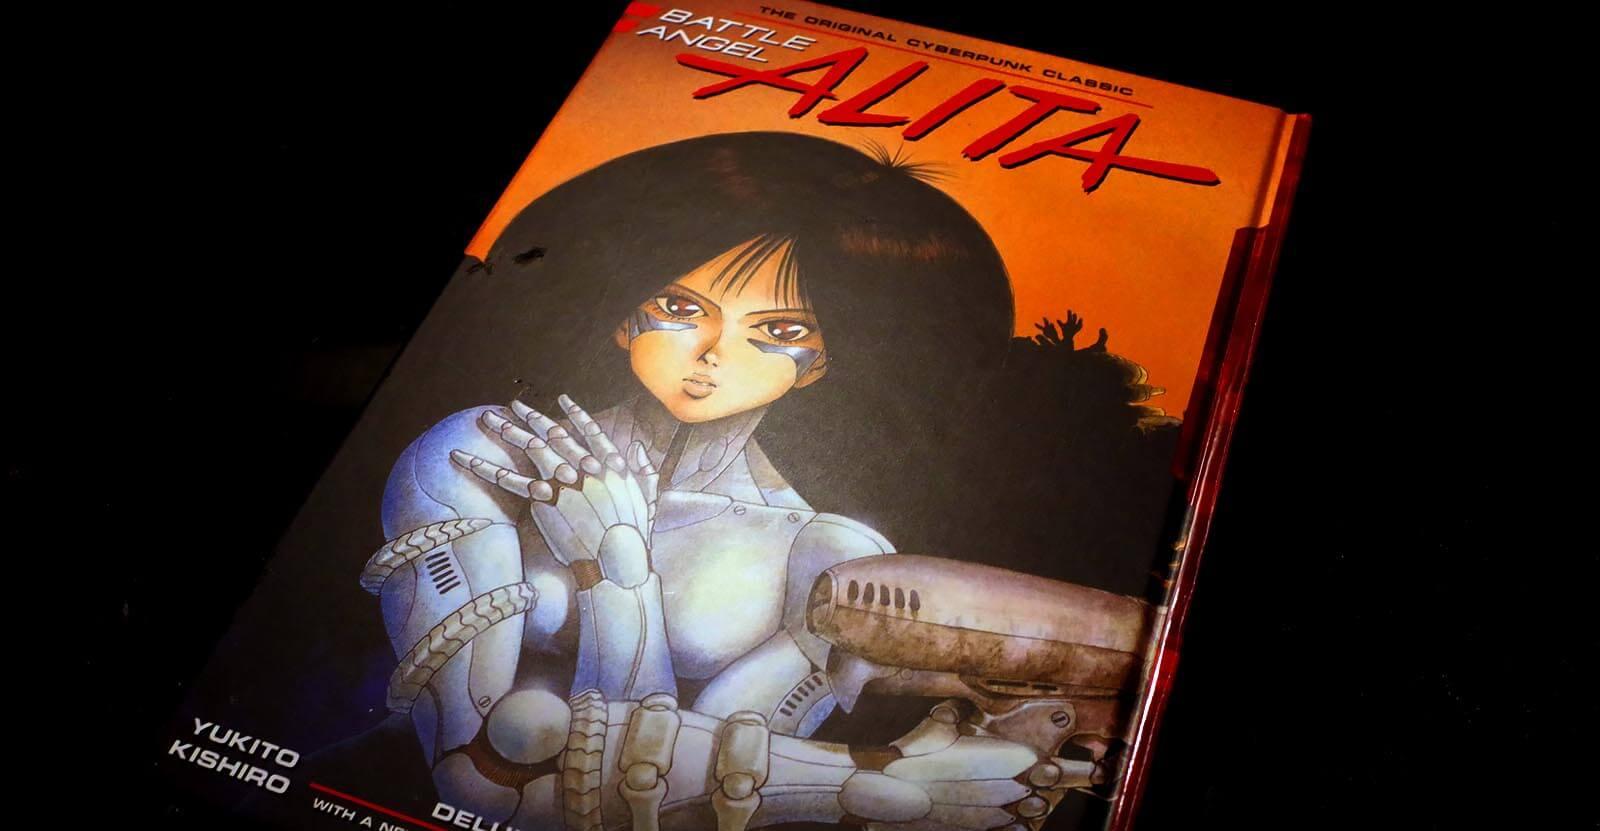 Battle Angel Alita Vol 1 Book Cover